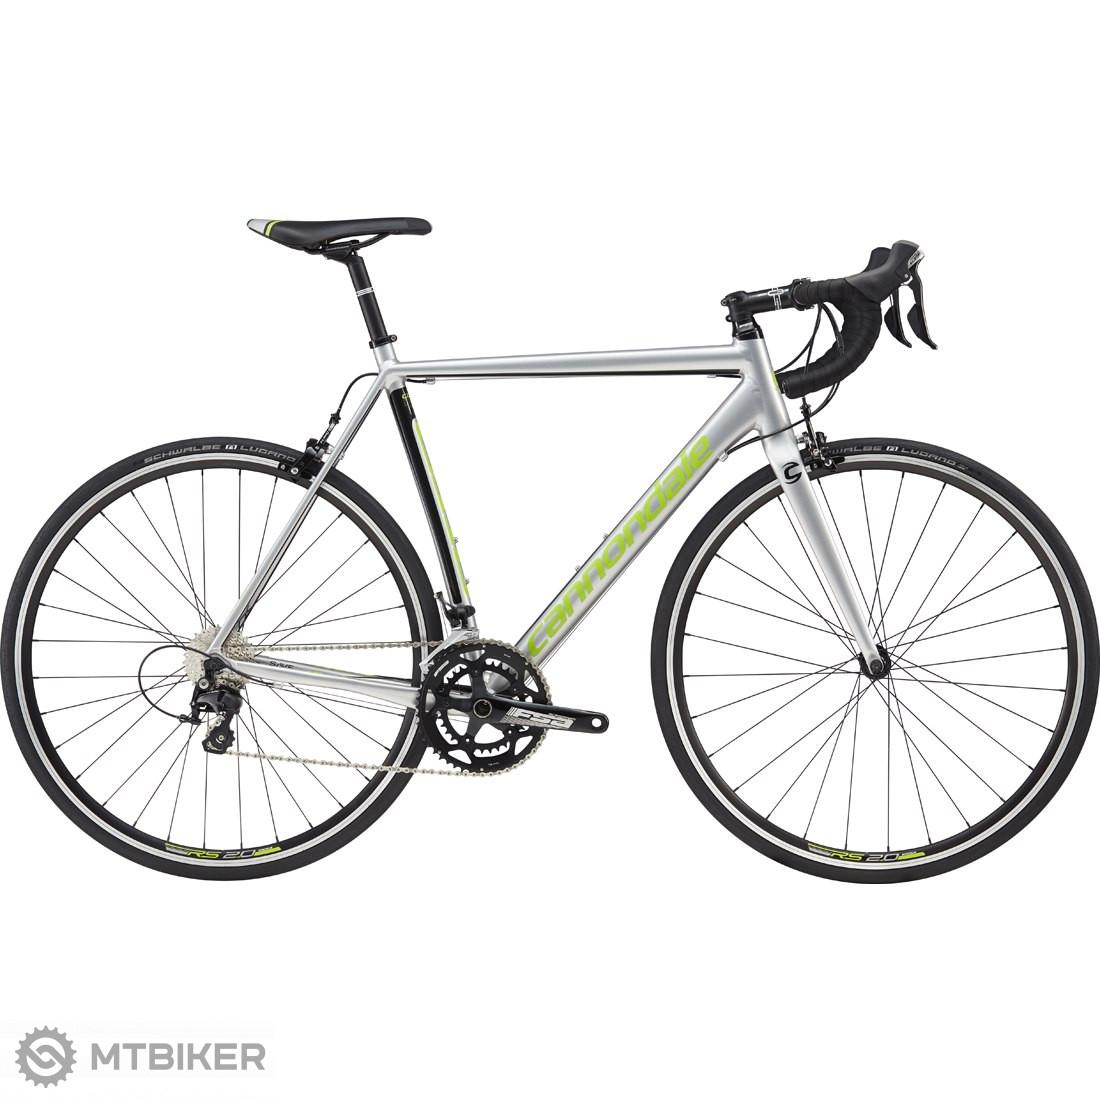 Cannondale CAAD Optimo 105 2018 Fine Silver cestný bicykel